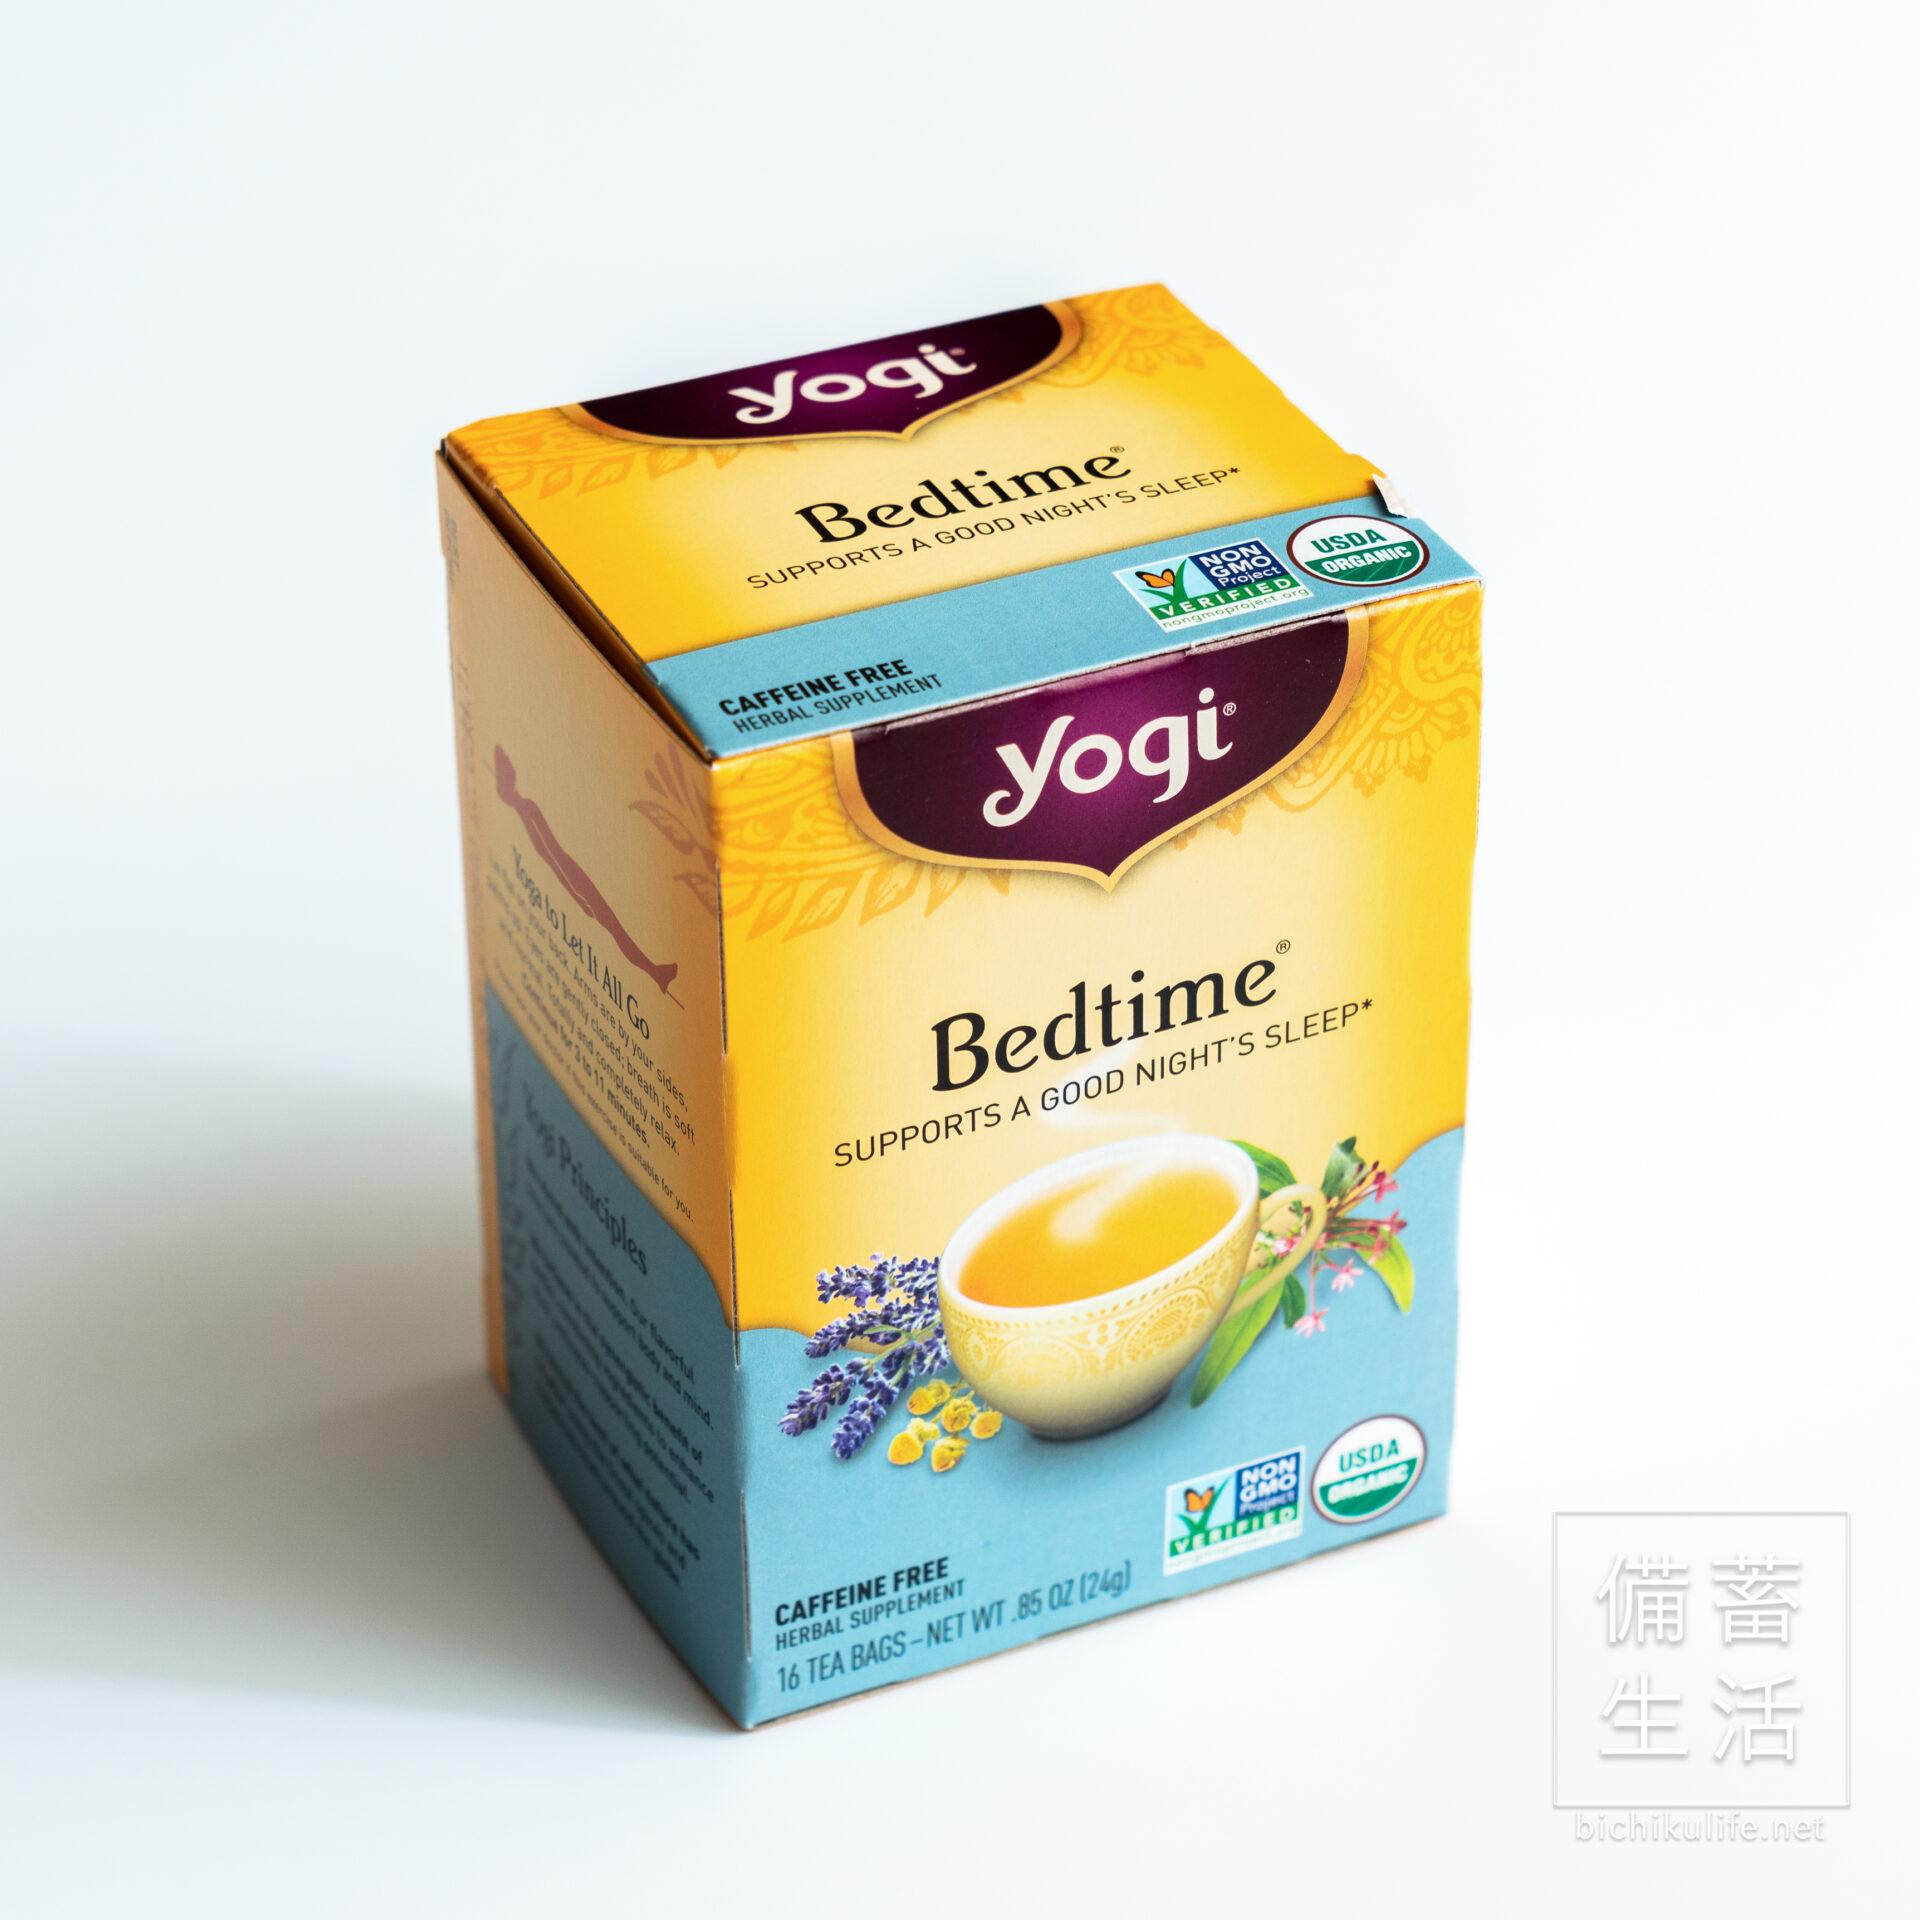 Yogi Tea カフェインフリー 有機ハーブティー Bedtime